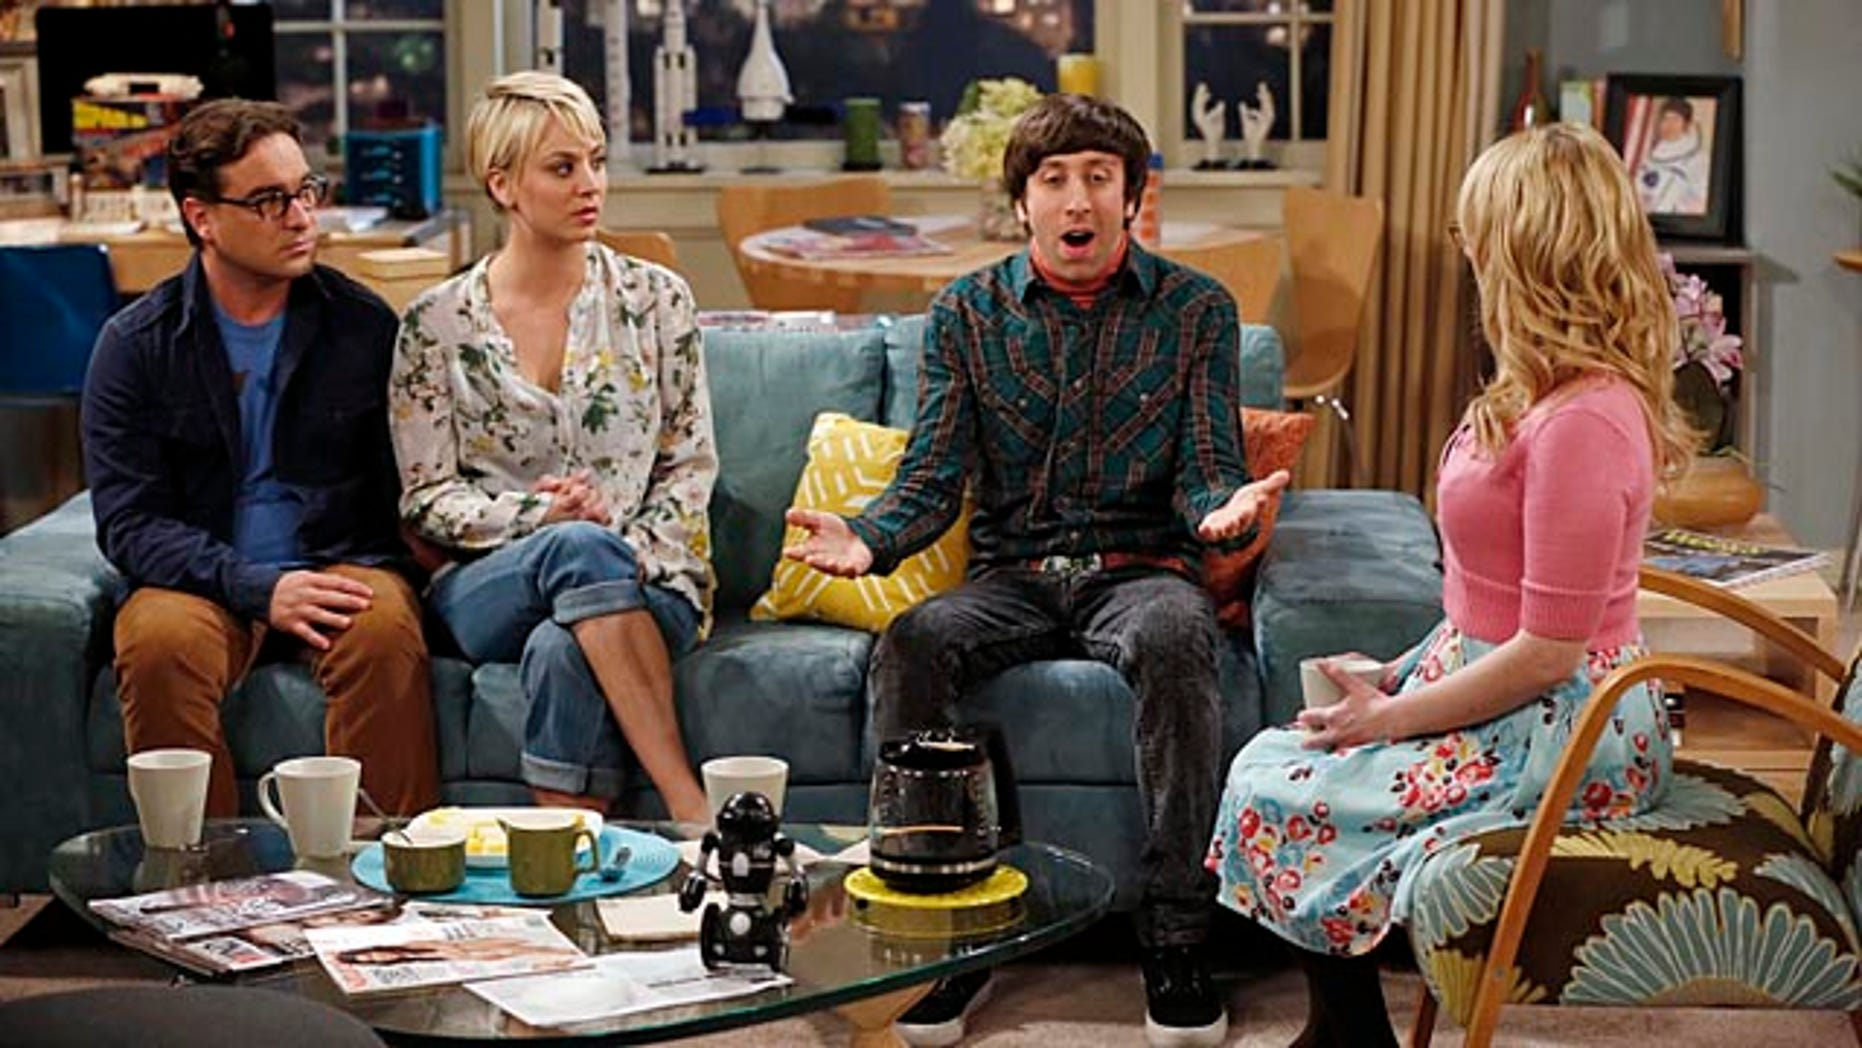 Johnny Galecki, Kaley Cuoco-Sweeting, Simon Helberg and Melissa Rauch discuss money on 'The Big Bang Theory'. (Monty Brinton/CBS)